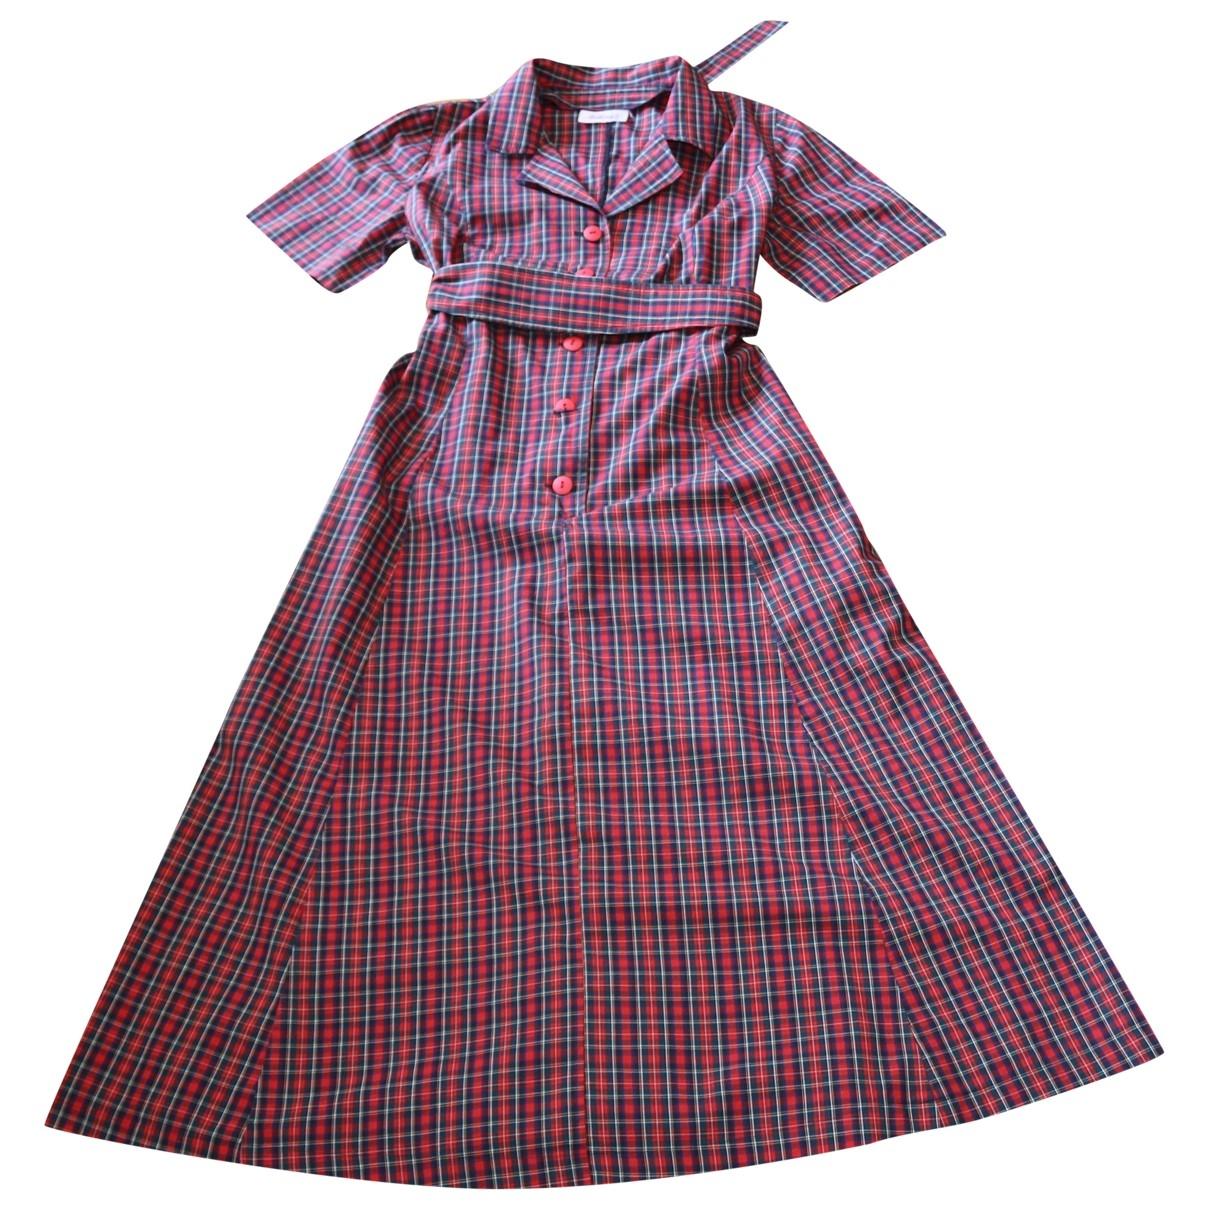 Melissa \N Red Cotton dress for Women 40 FR